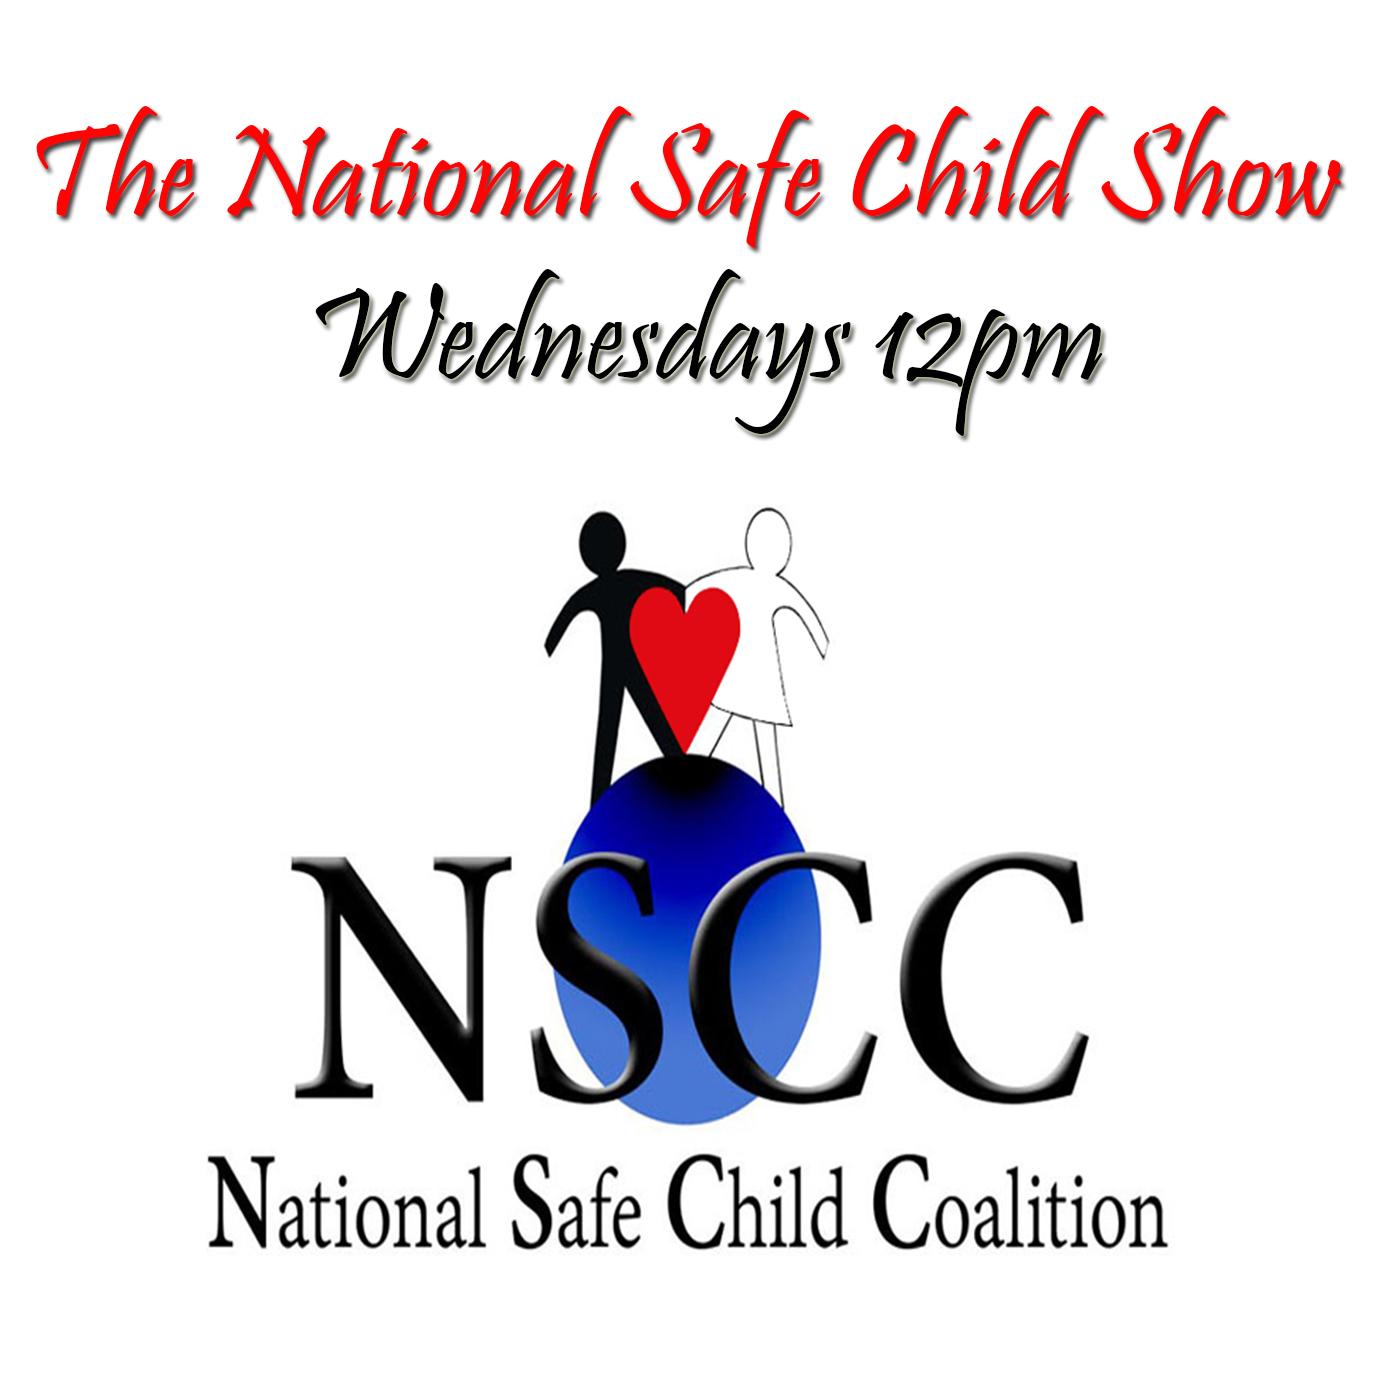 <![CDATA[The National Safe Child Show]]>